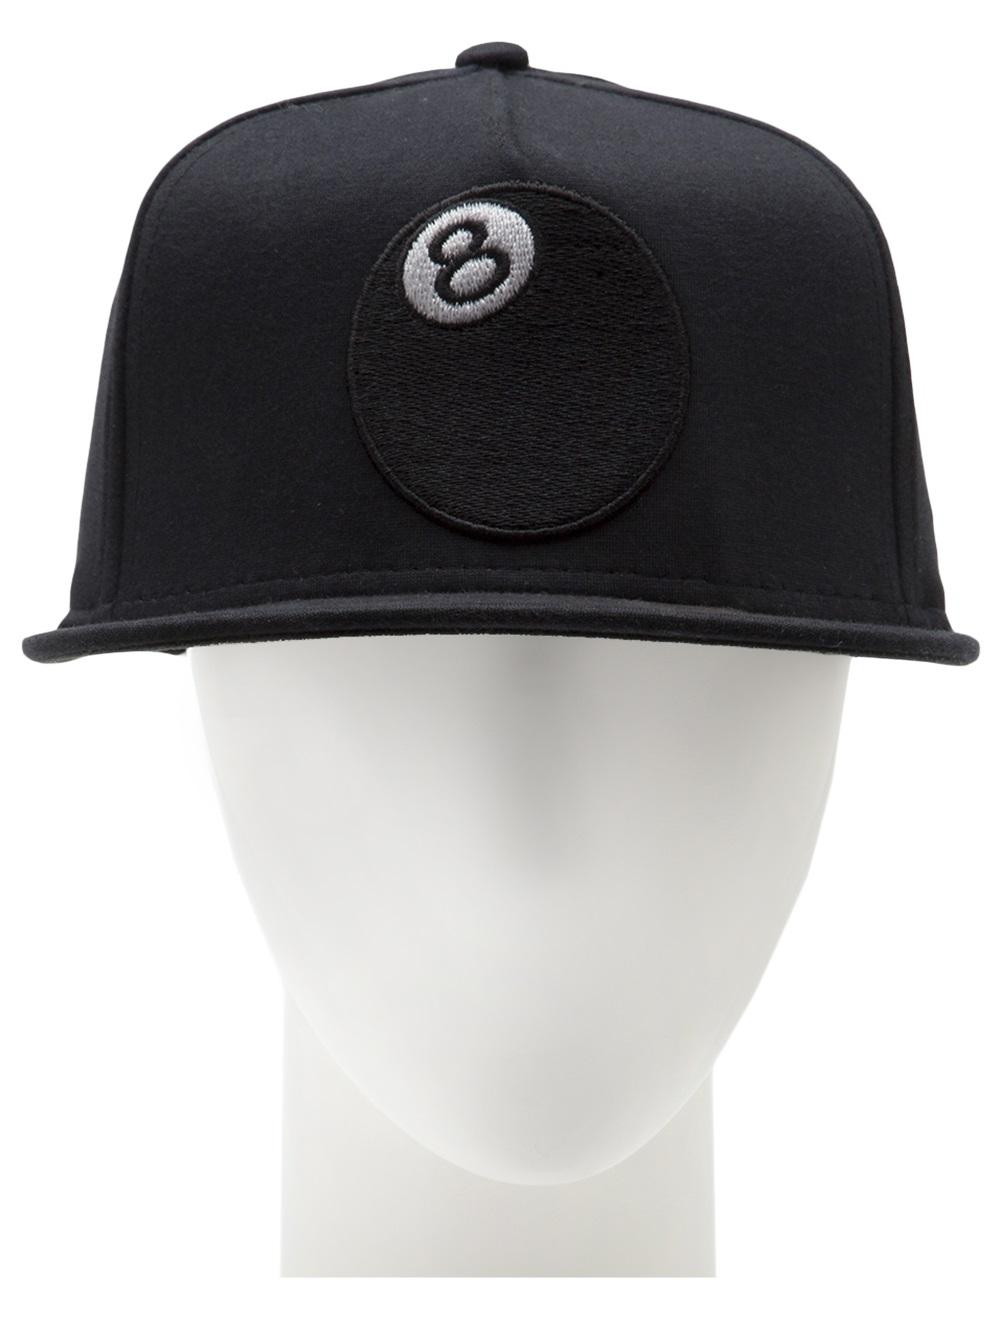 0f838da5bc0 Gallery. Previously sold at  Farfetch · Men s Snapbacks Men s Canada Goose  Aviator Men s Baseball Caps ...